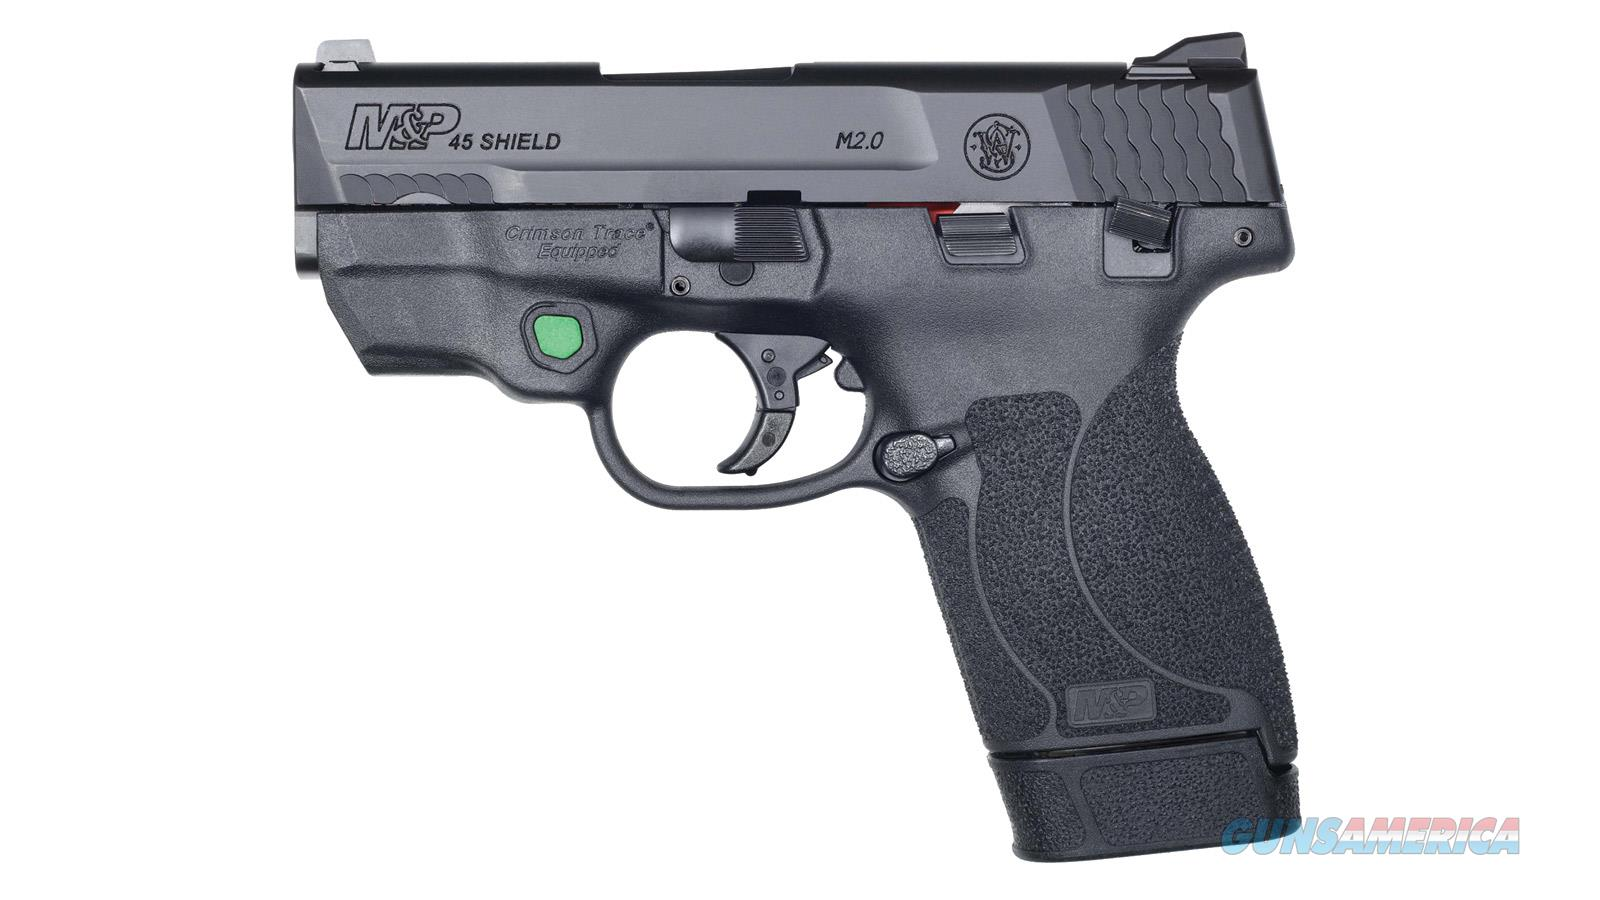 Smith & Wesson M&P45 Shield M2.0 45Acp Ct Green Laser Ts 12089  Guns > Pistols > S Misc Pistols